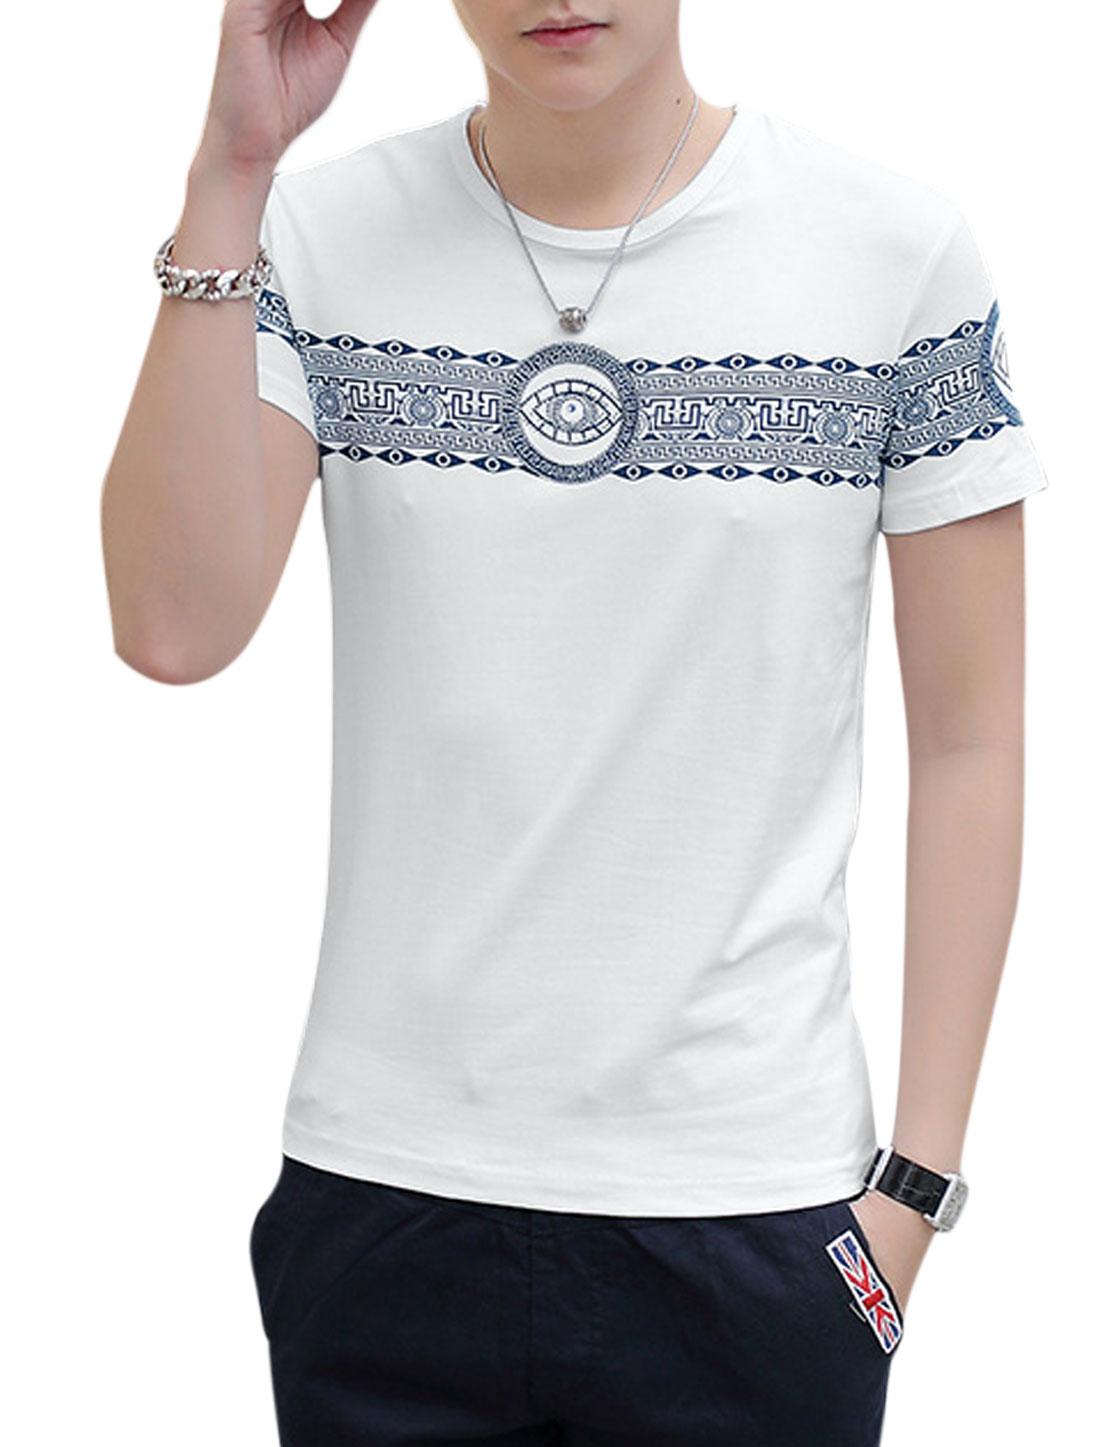 Man Geometric Prints Diamante Short Sleeves Slipover T-shirt White M